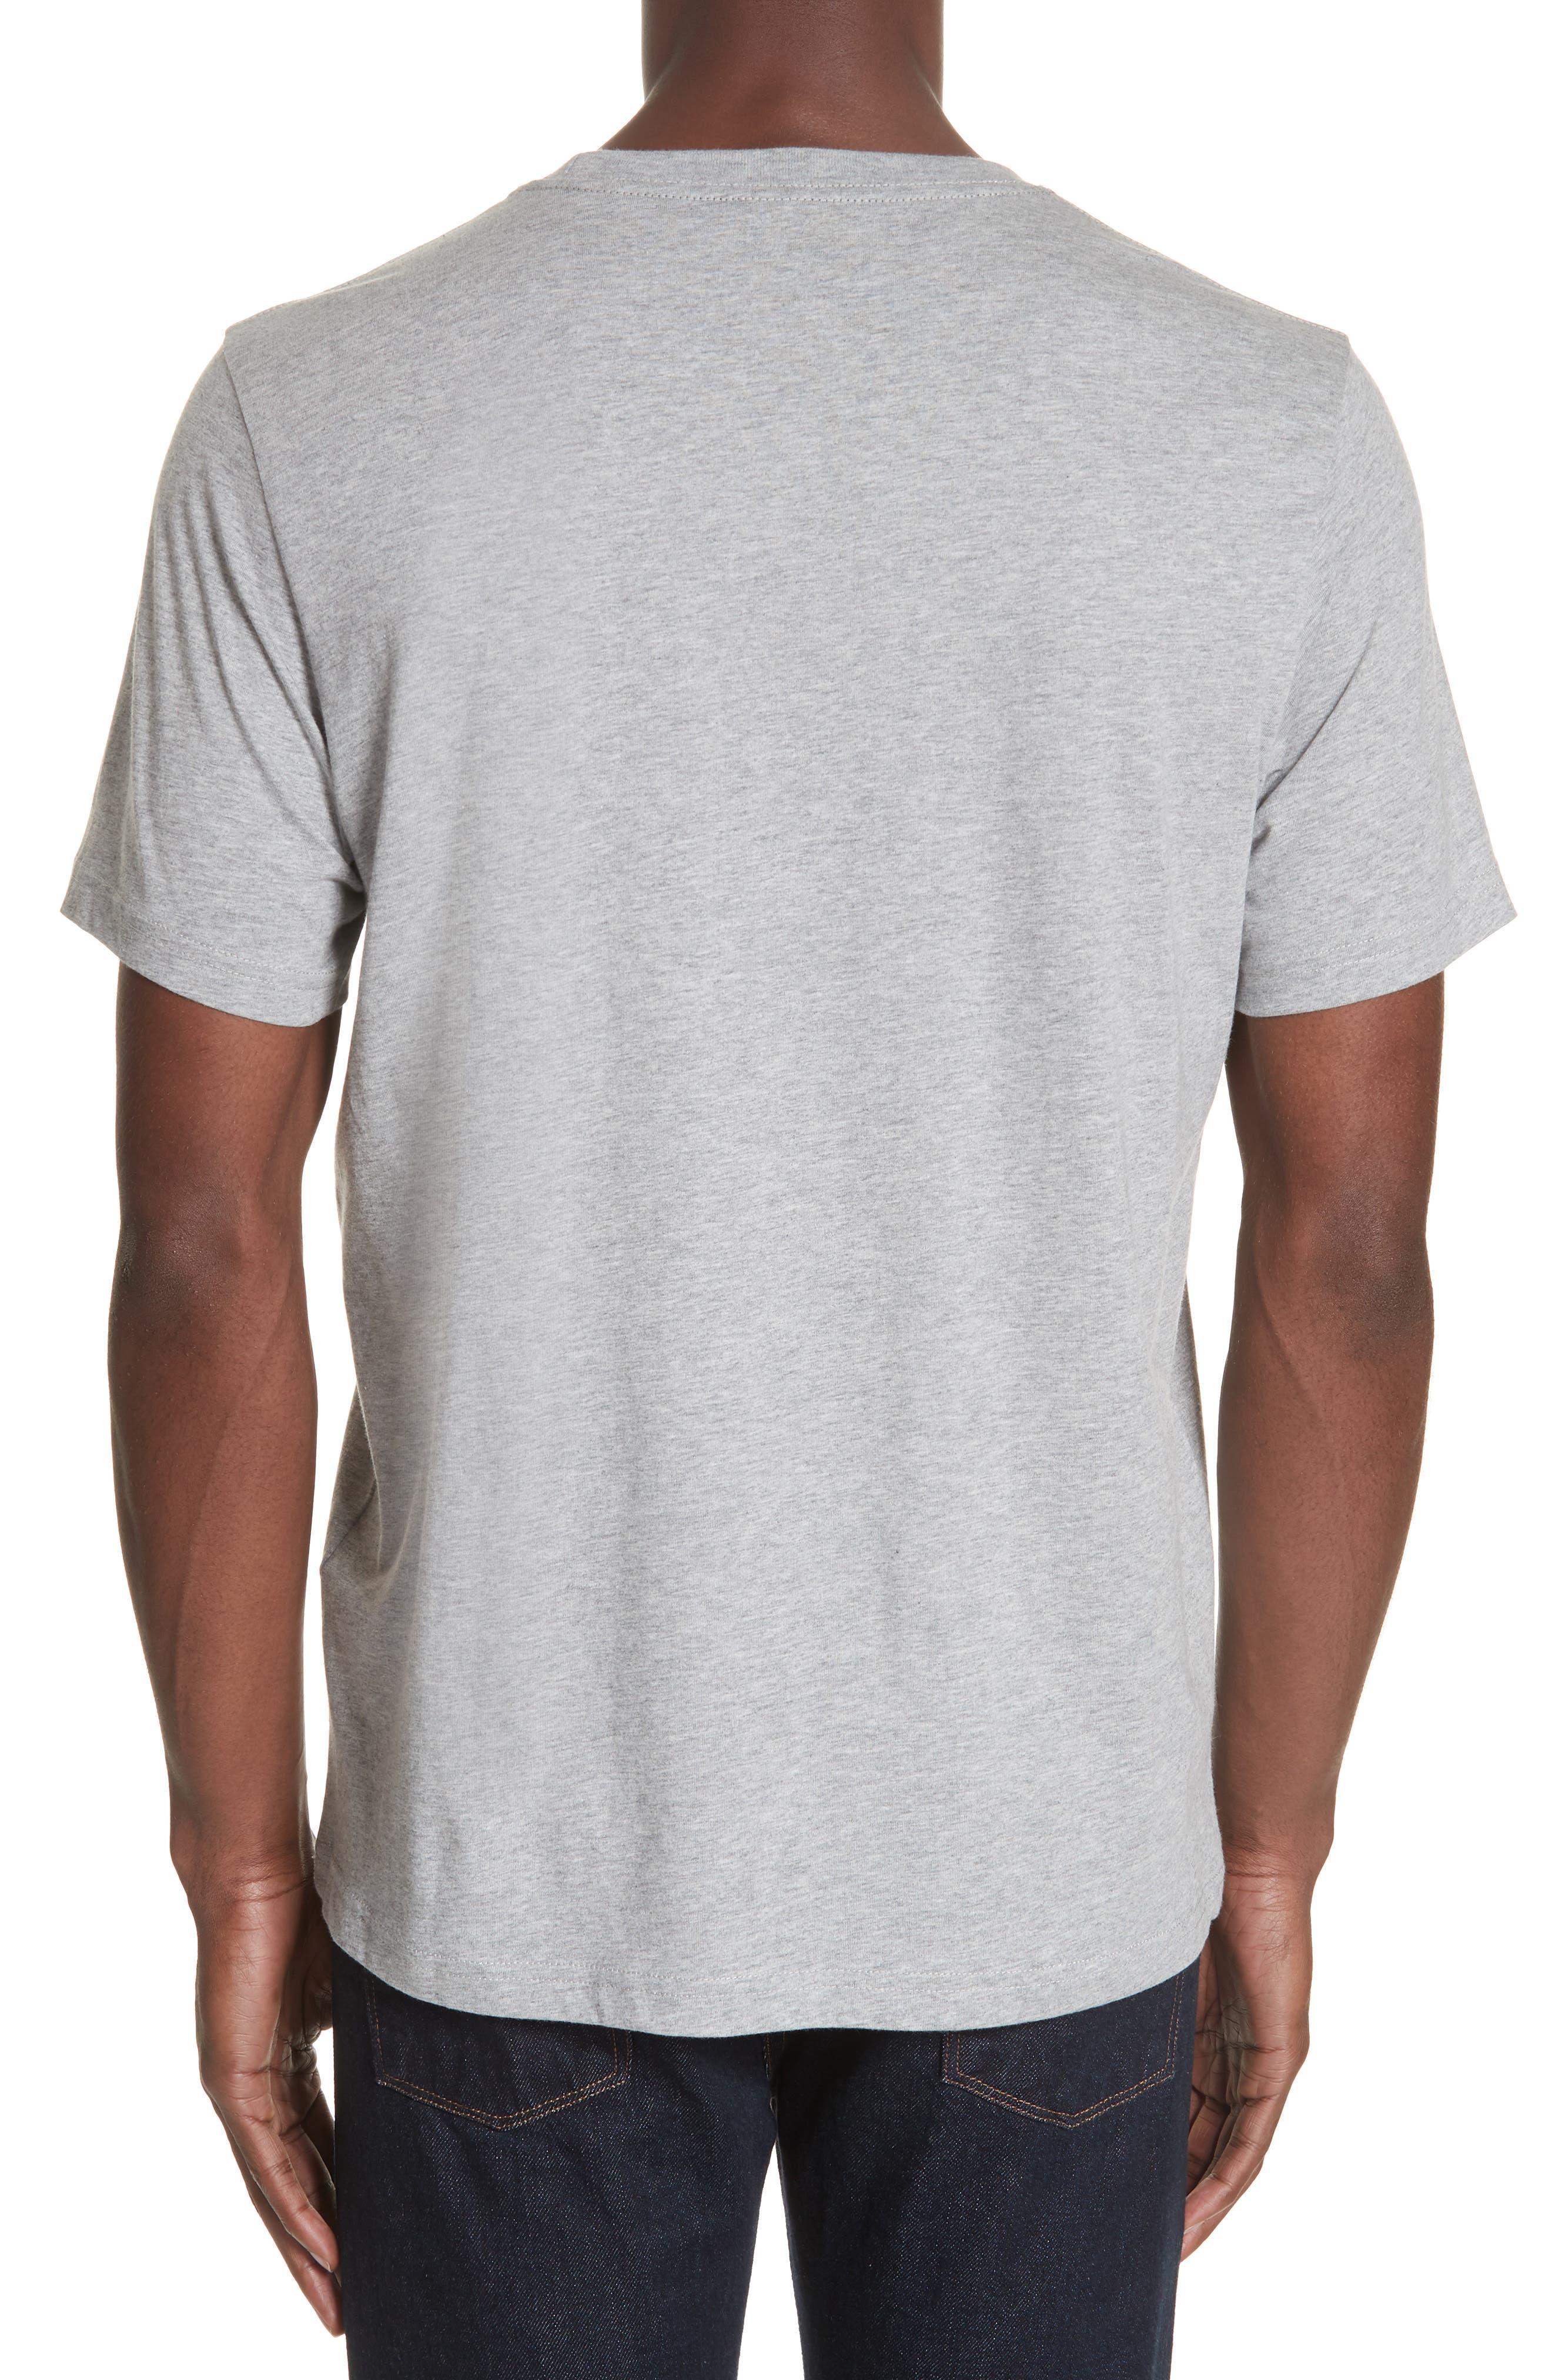 Zebra Organic Cotton T-Shirt,                             Alternate thumbnail 2, color,                             GREY